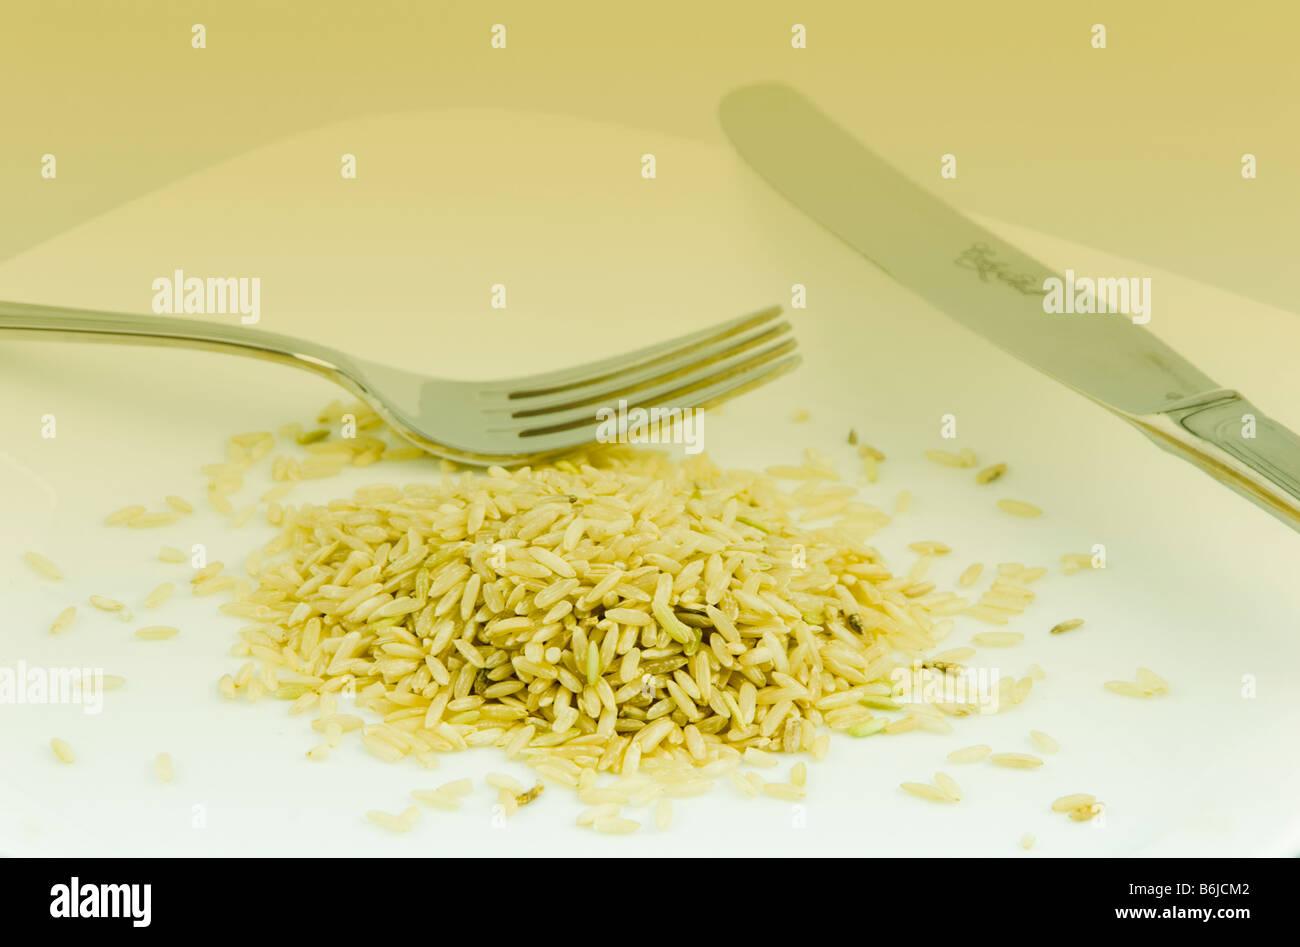 Food crisis - Stock Image